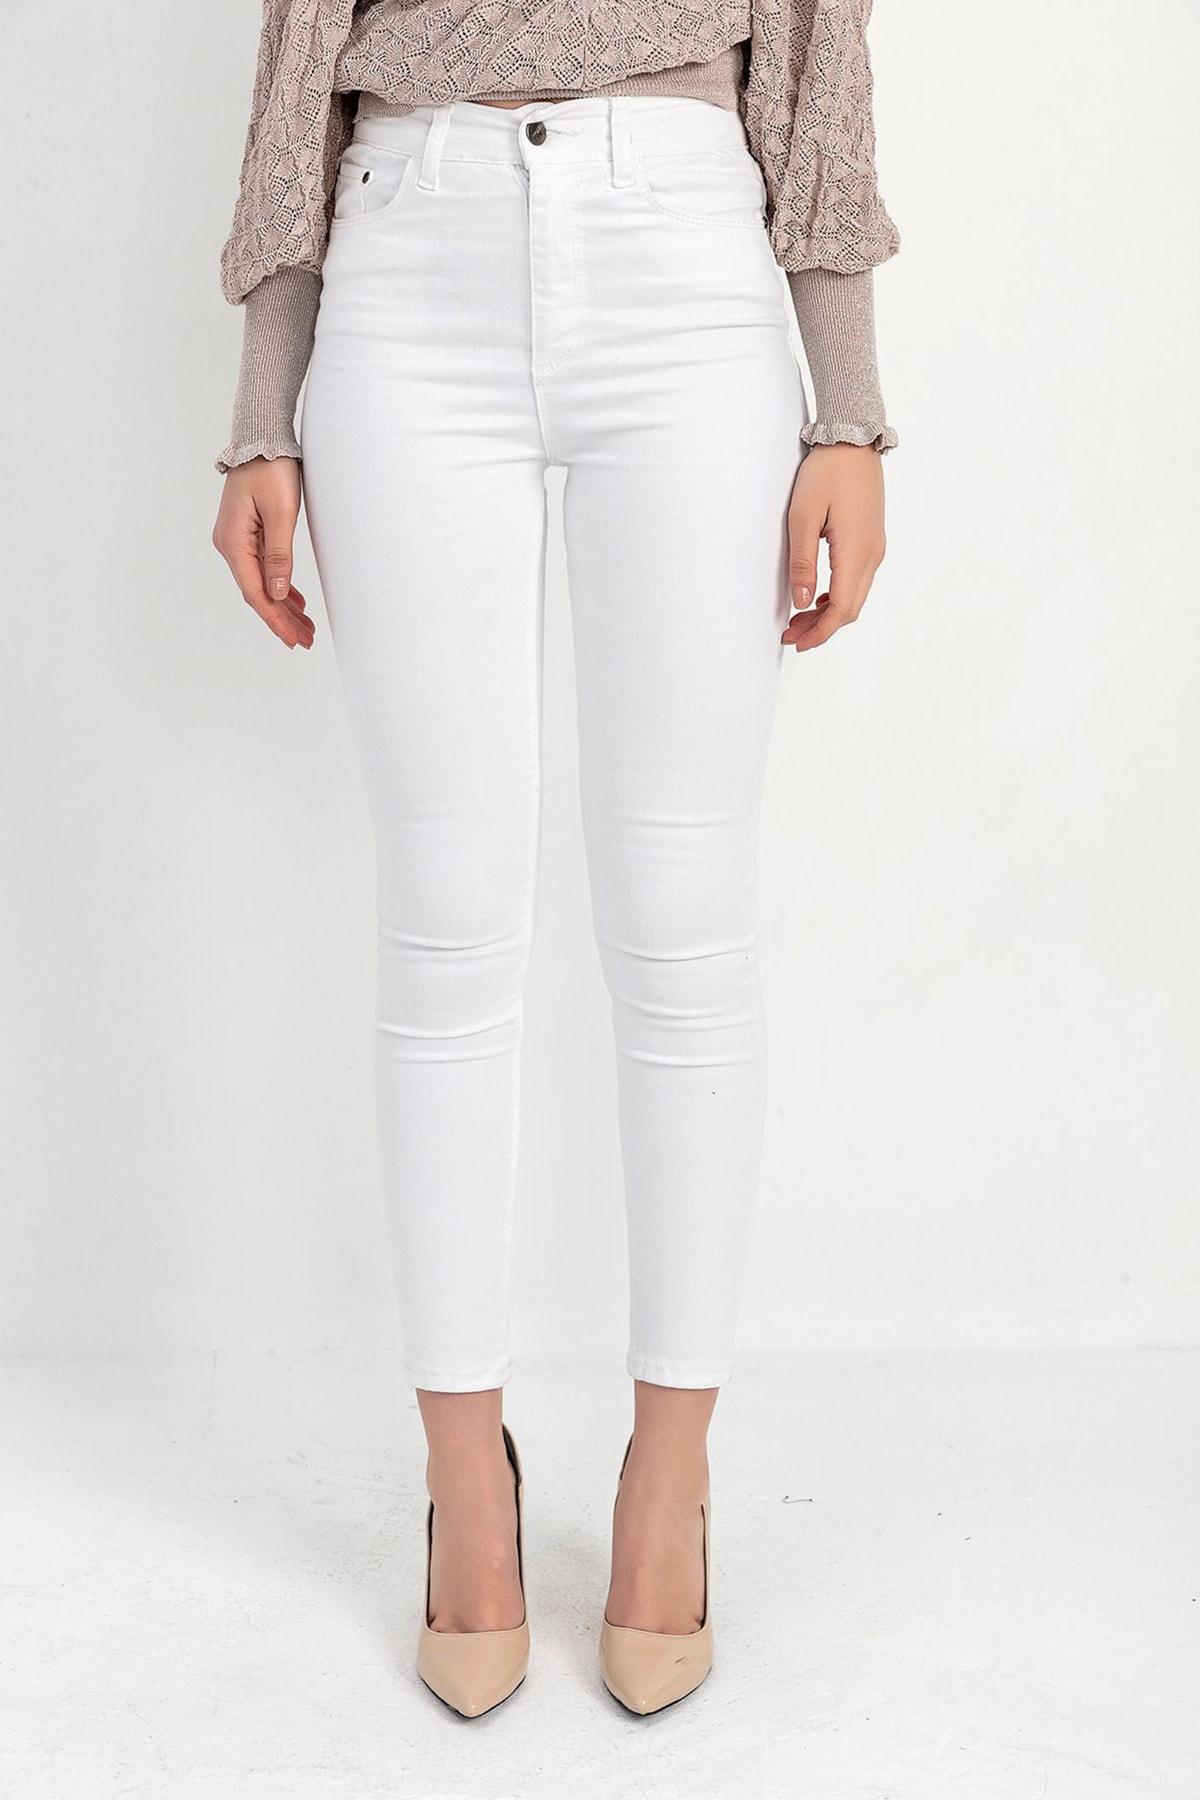 TIFFANY&TOMATO Kadın Beyaz Gabardin Dar Paca Pantolon Y20036_PNT_891D_T_D1 2